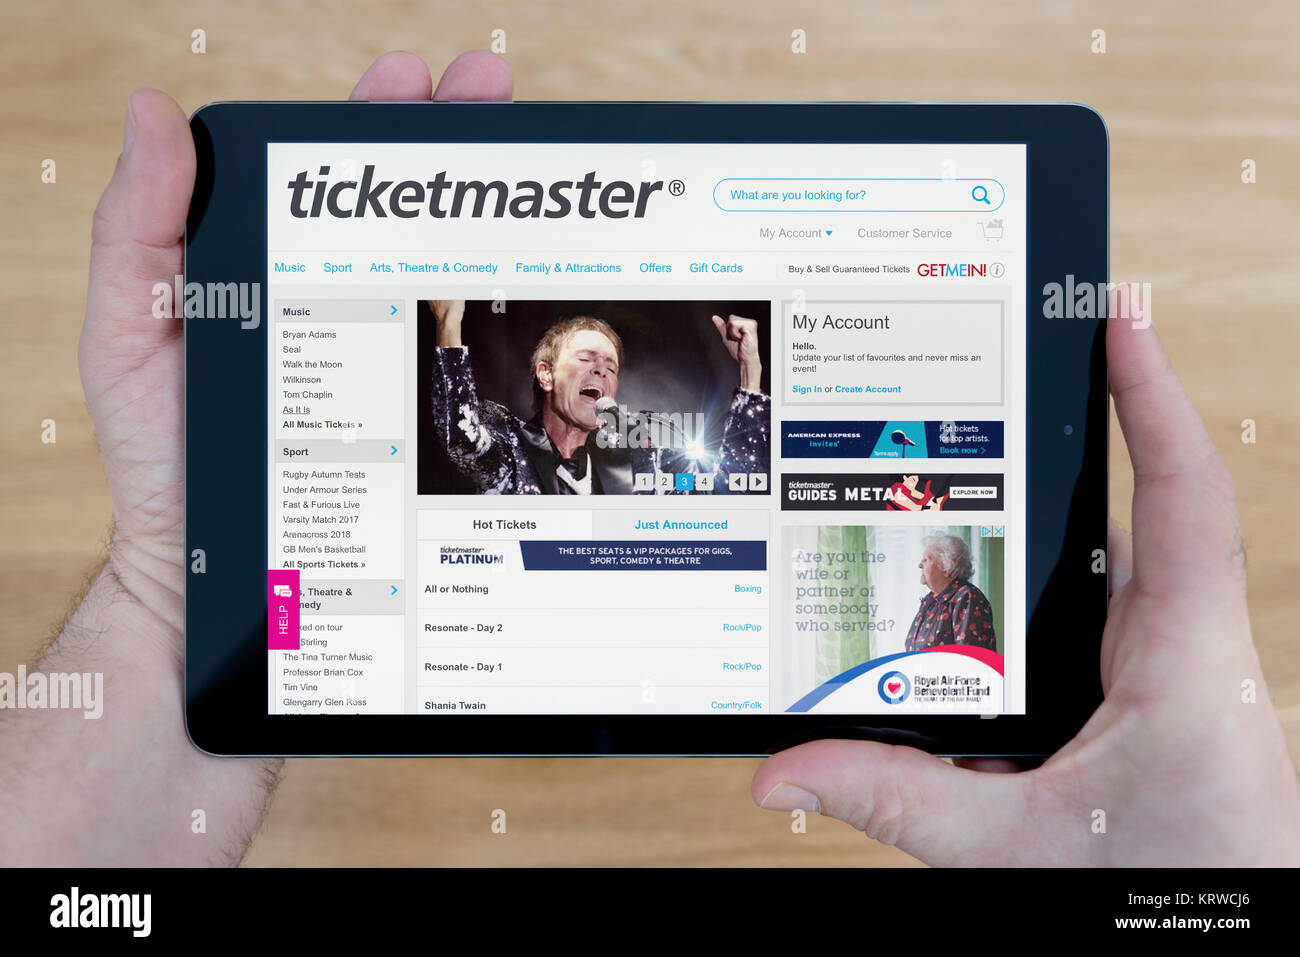 ticketmaster customer service